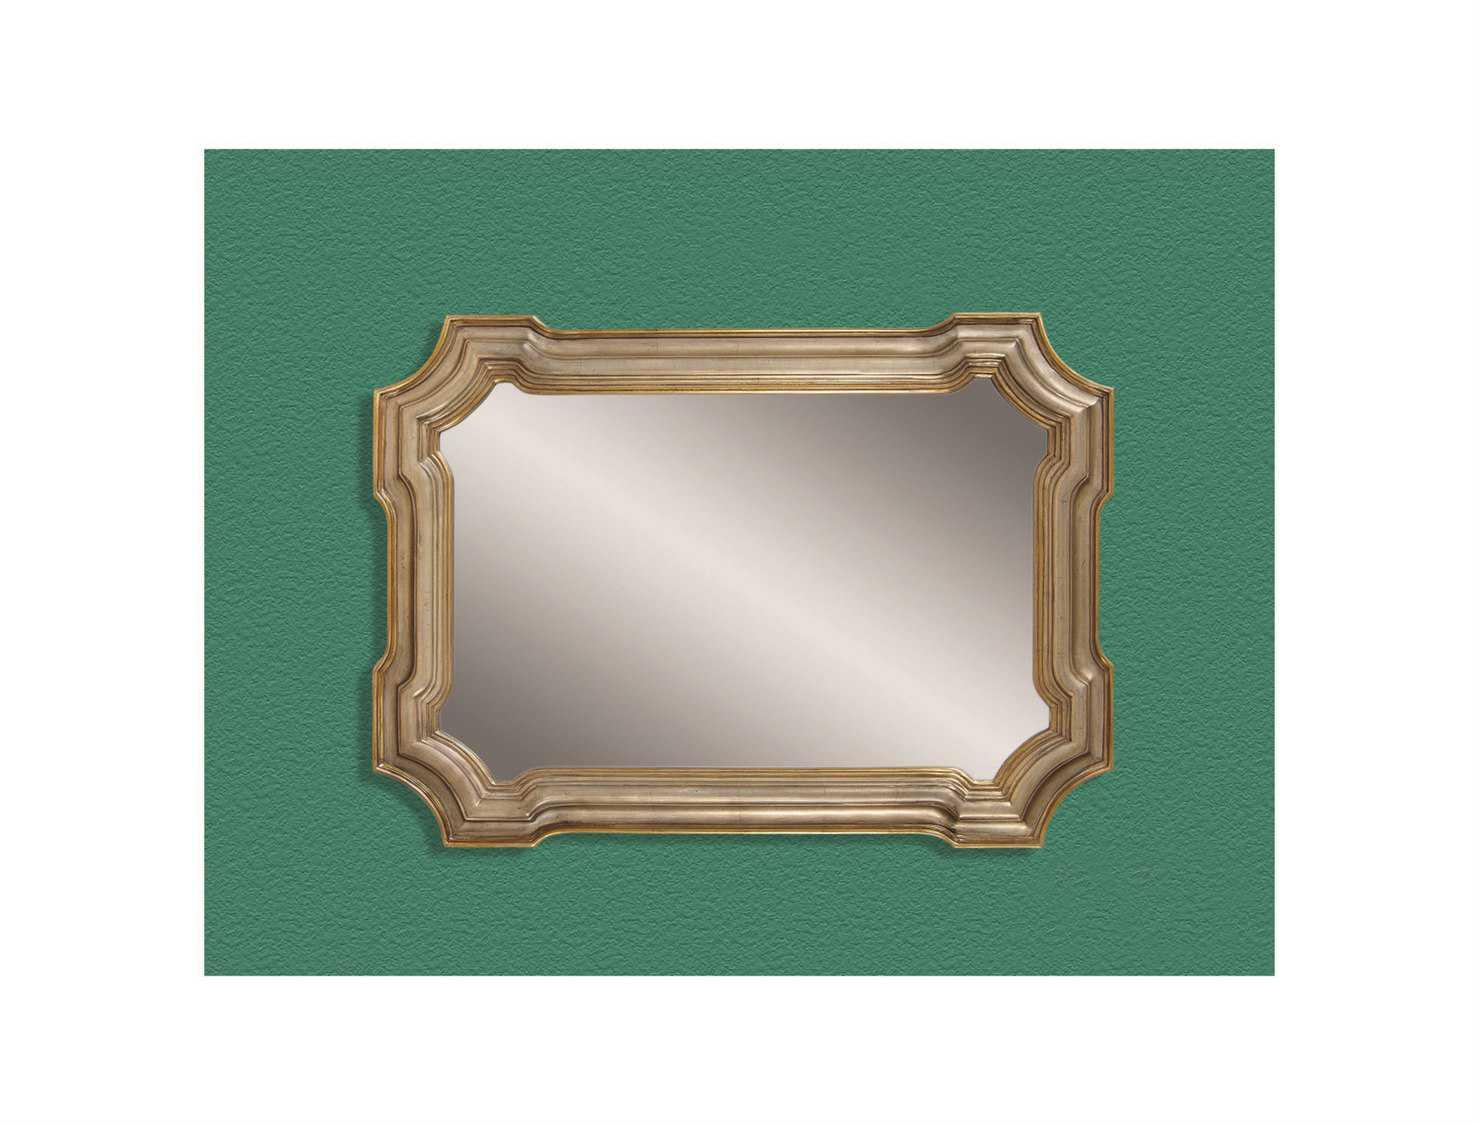 Bassett Mirror Old World 43 X 31 Silver & Gold Angelica